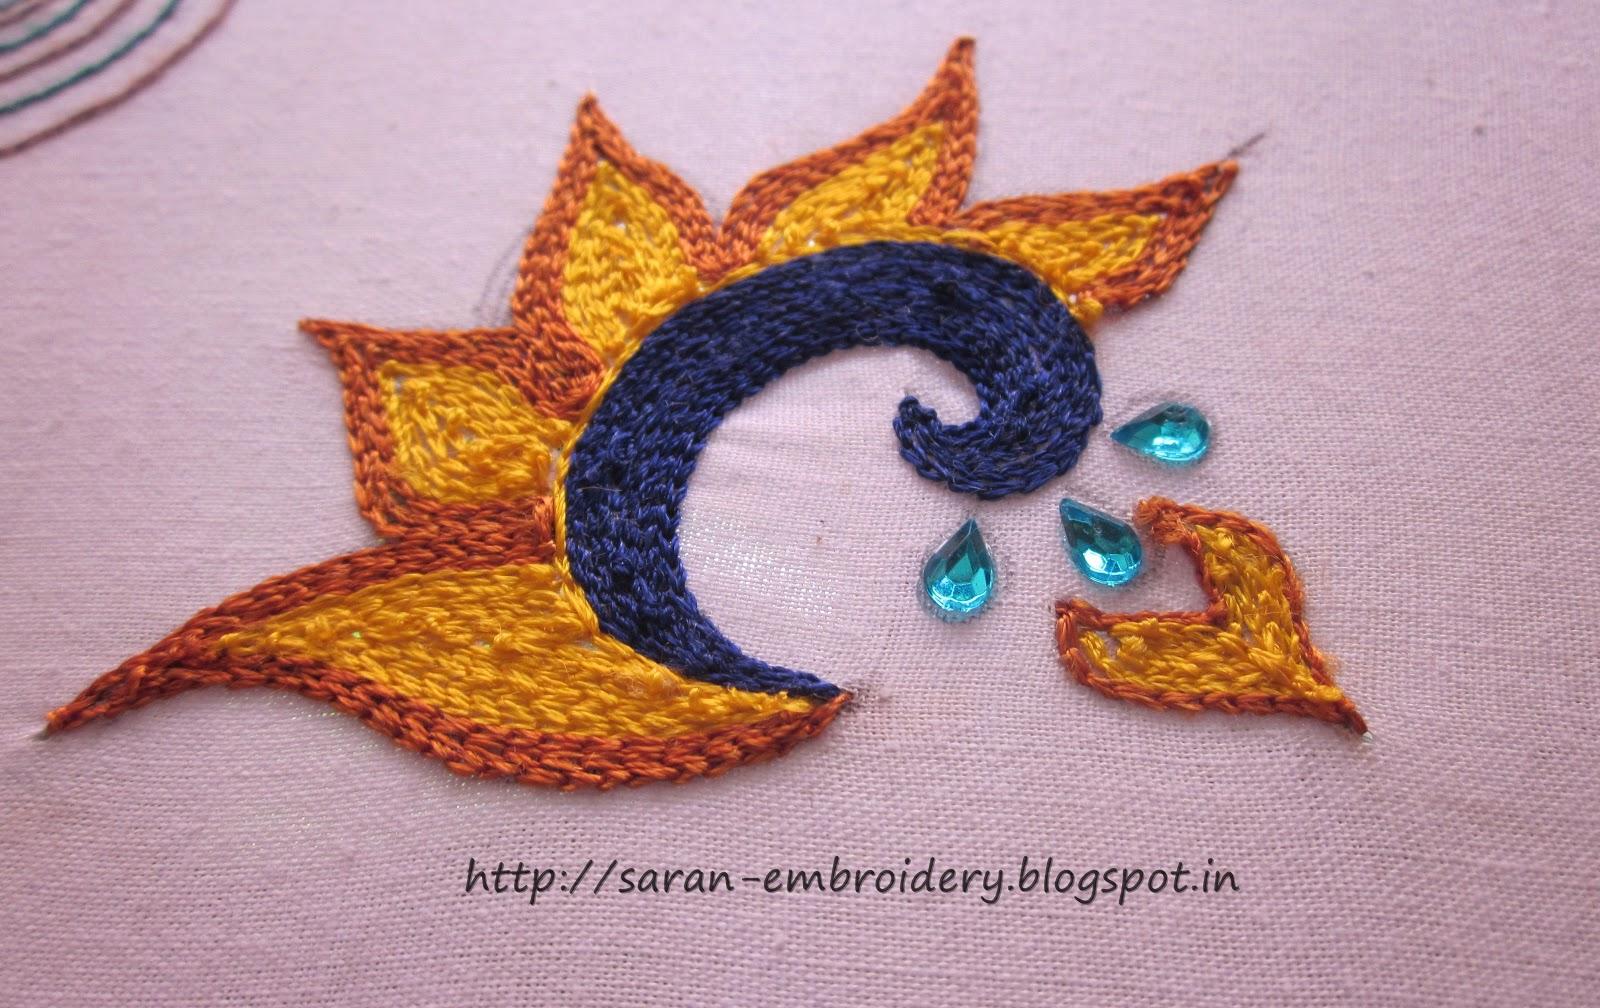 Saran embroidery design of aari